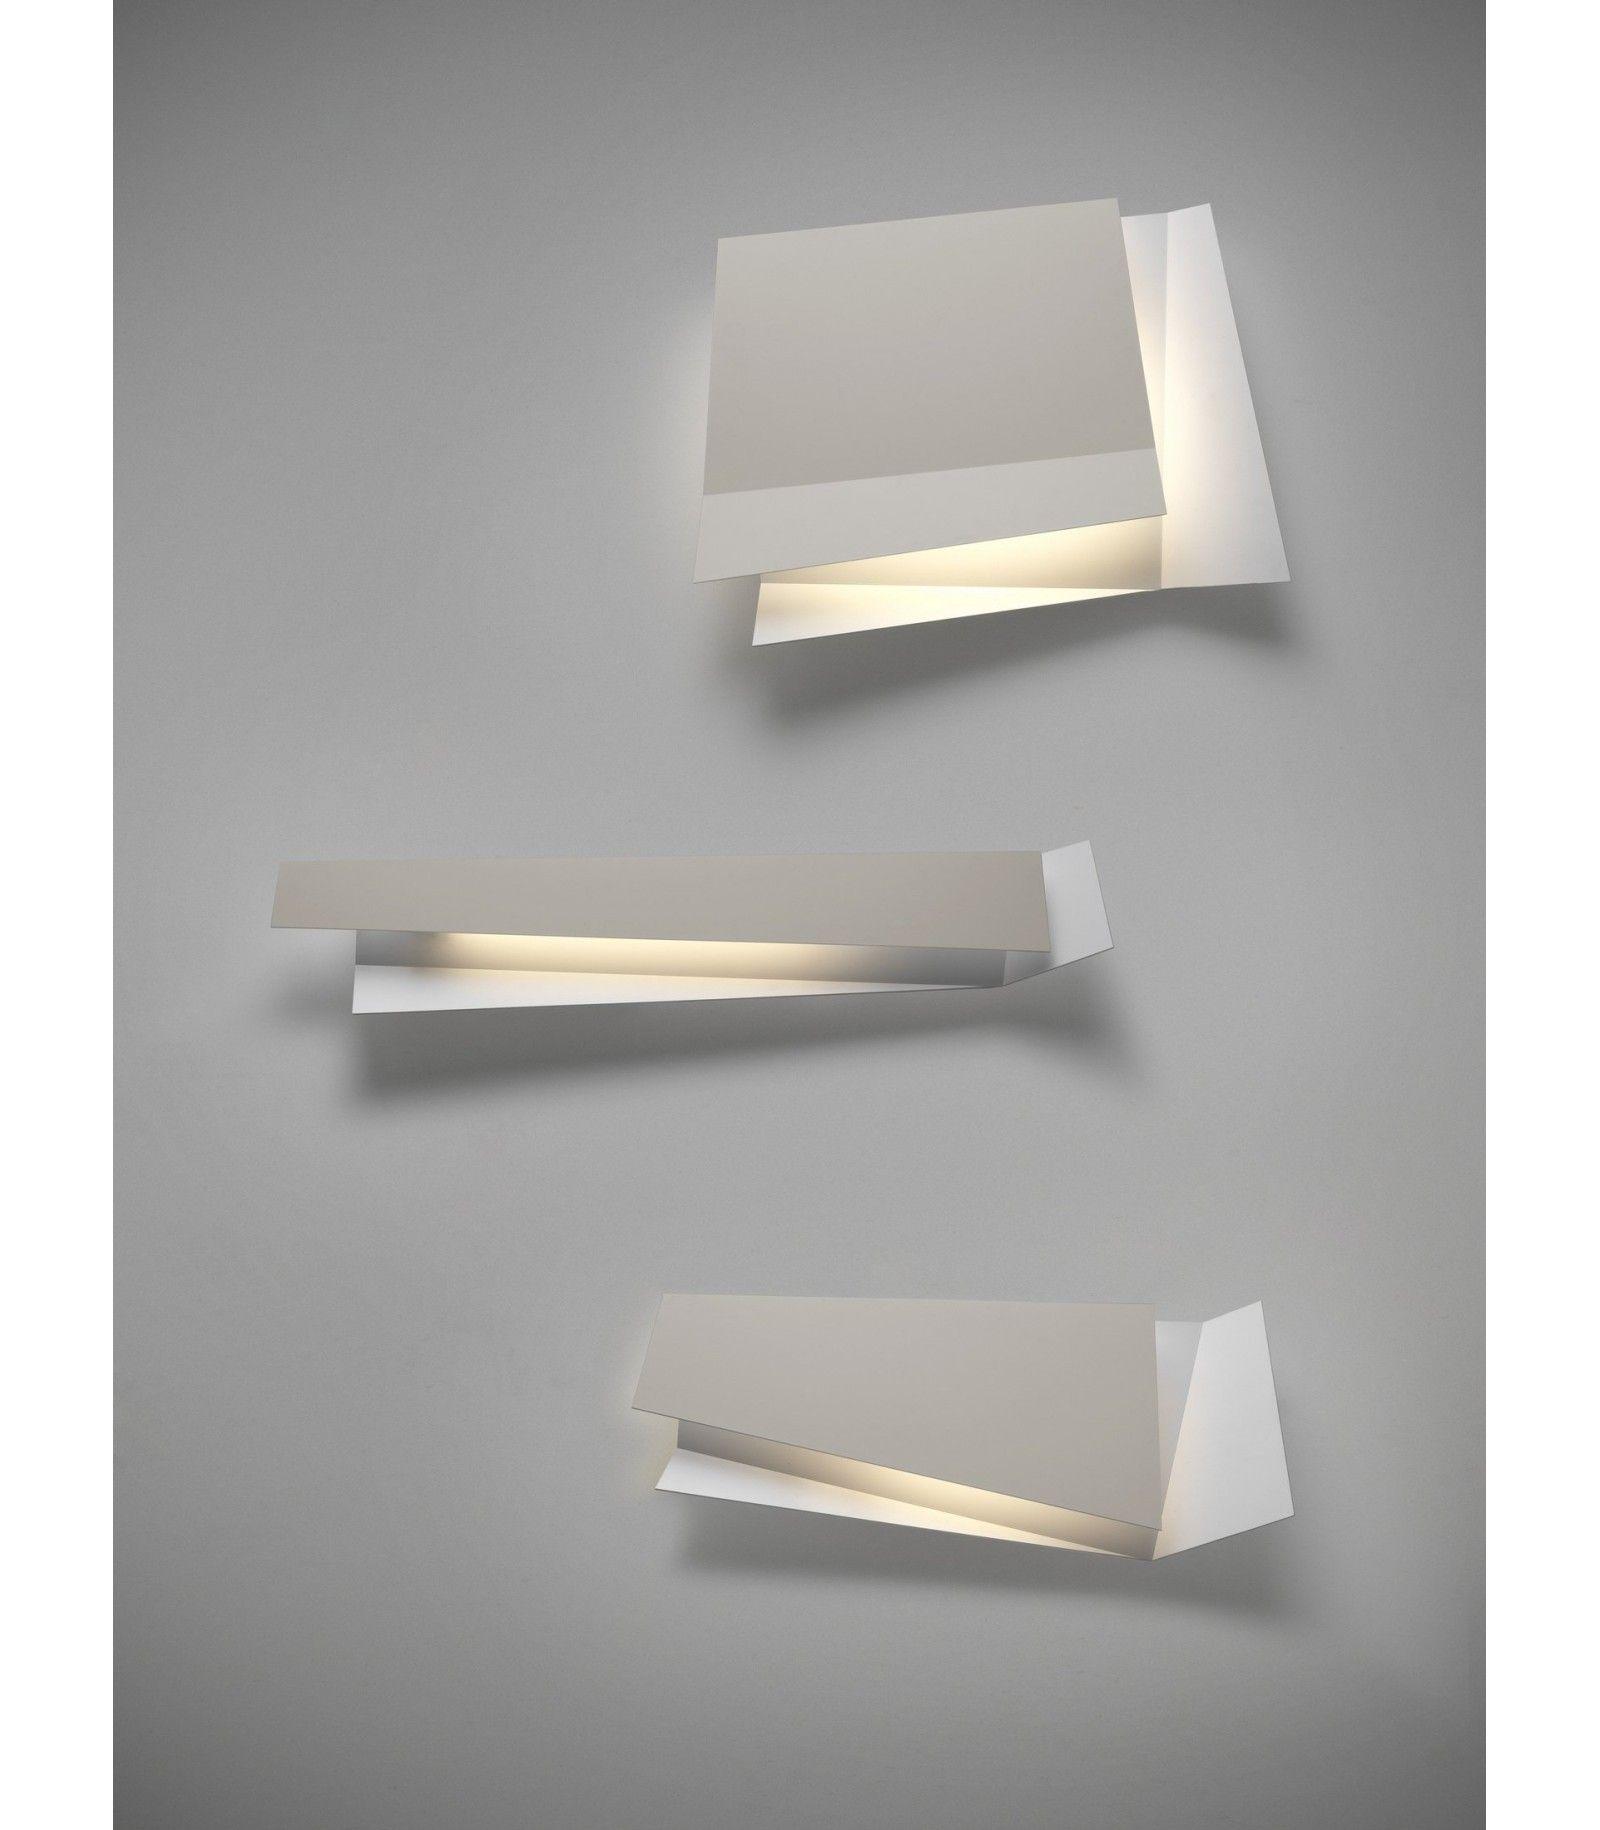 Applique Ikea Da Interno ikea lampade da soffitto lampada sospensione ikea with ikea